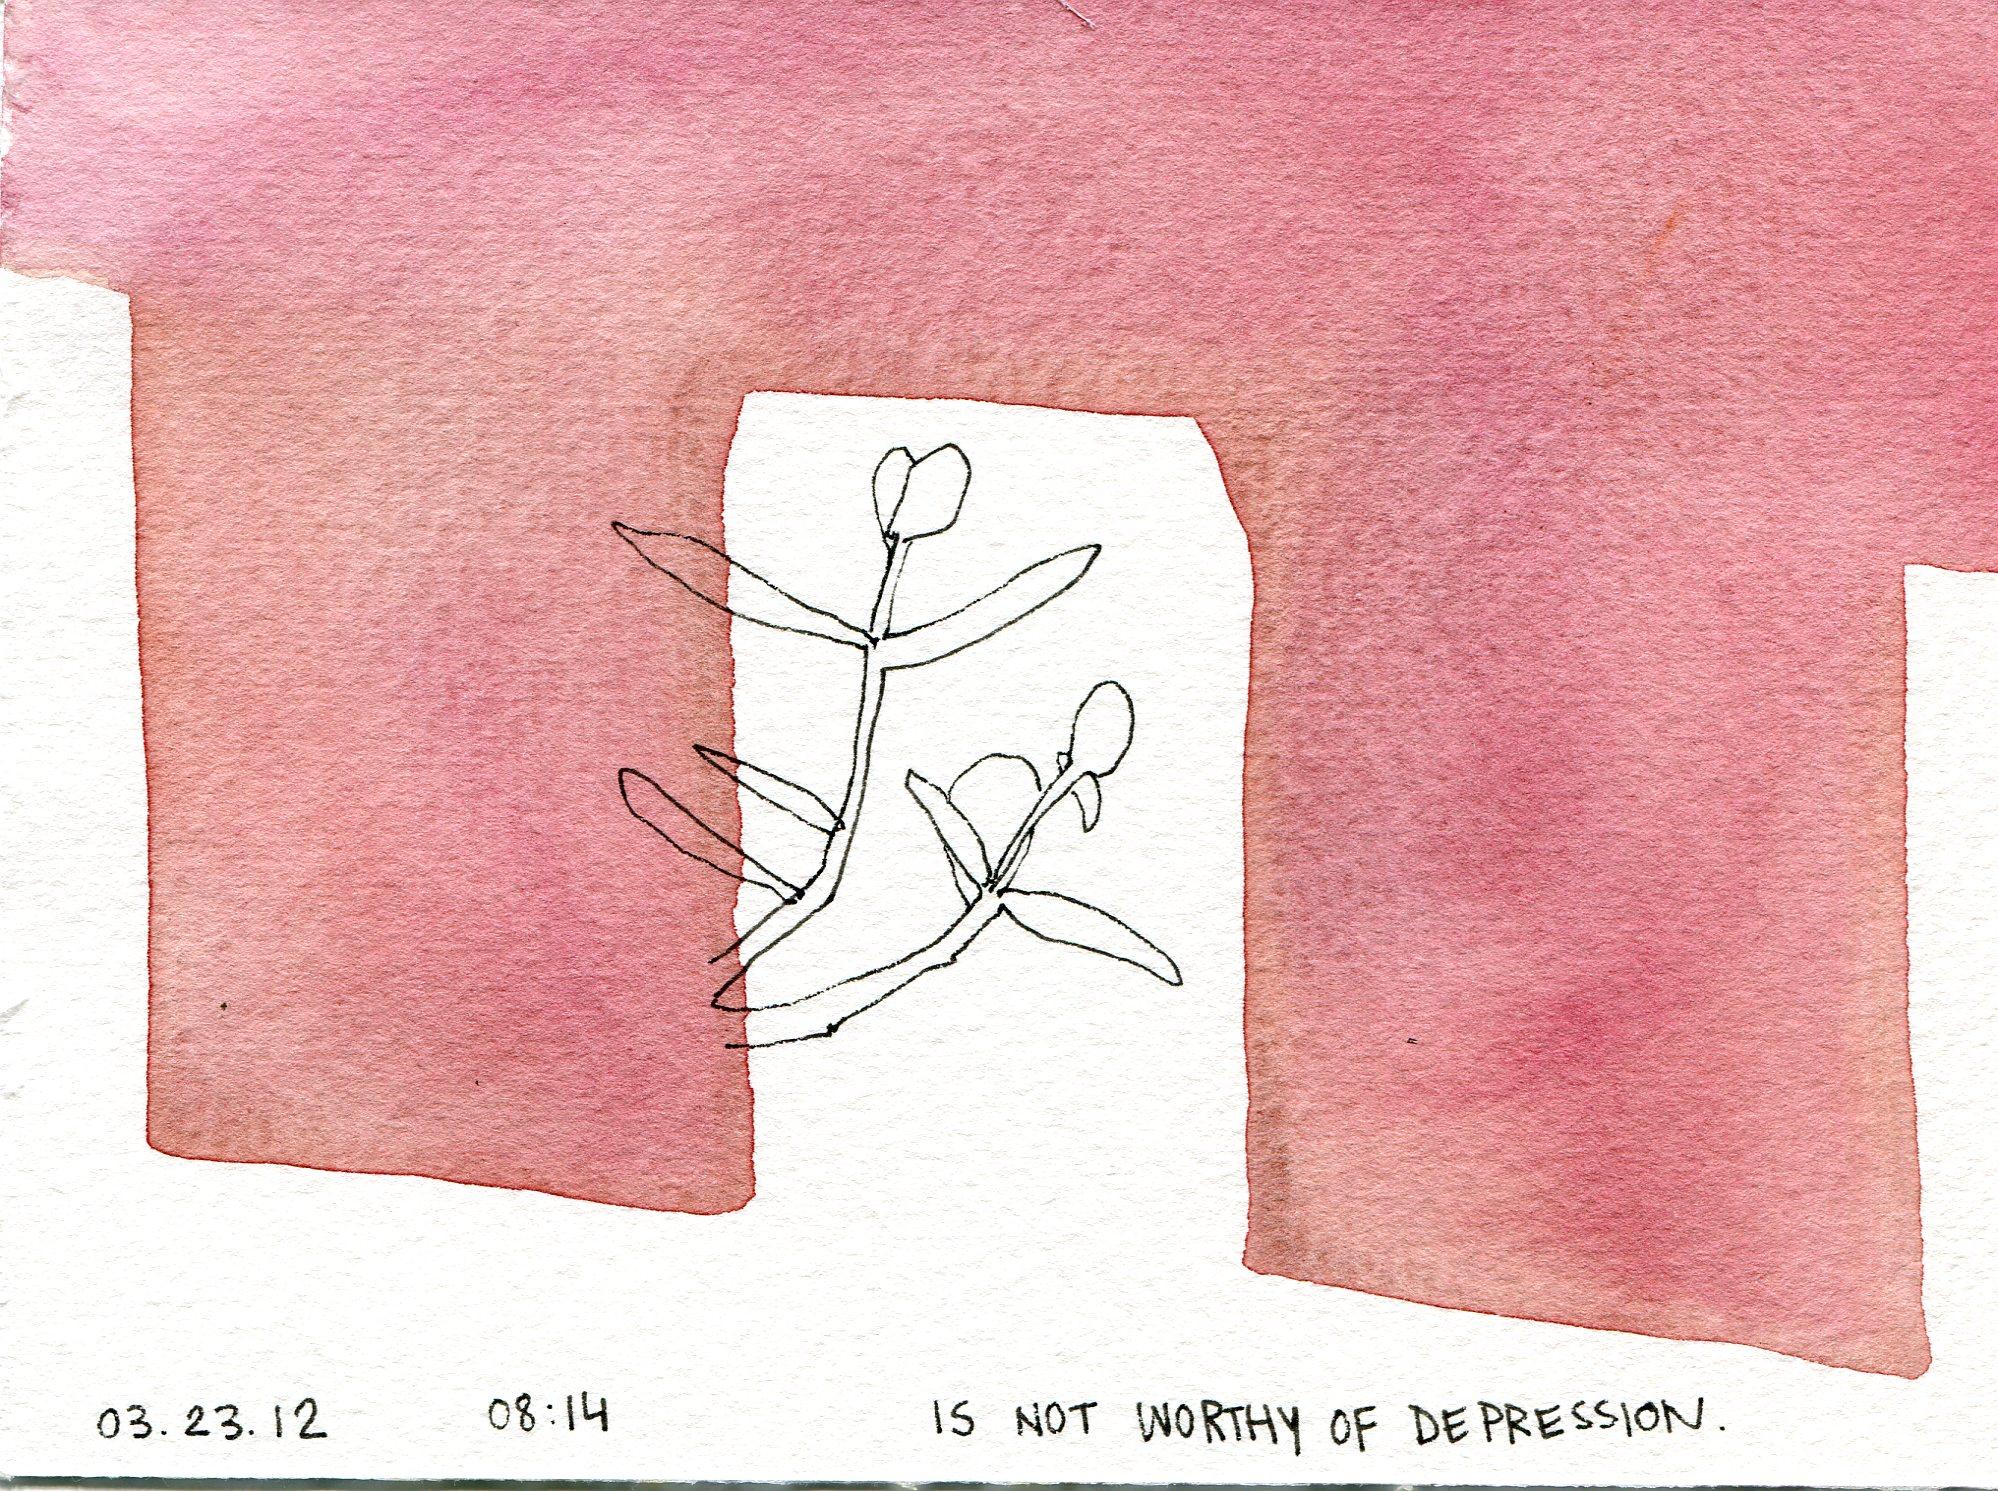 2012-03-23 drawing006.jpg